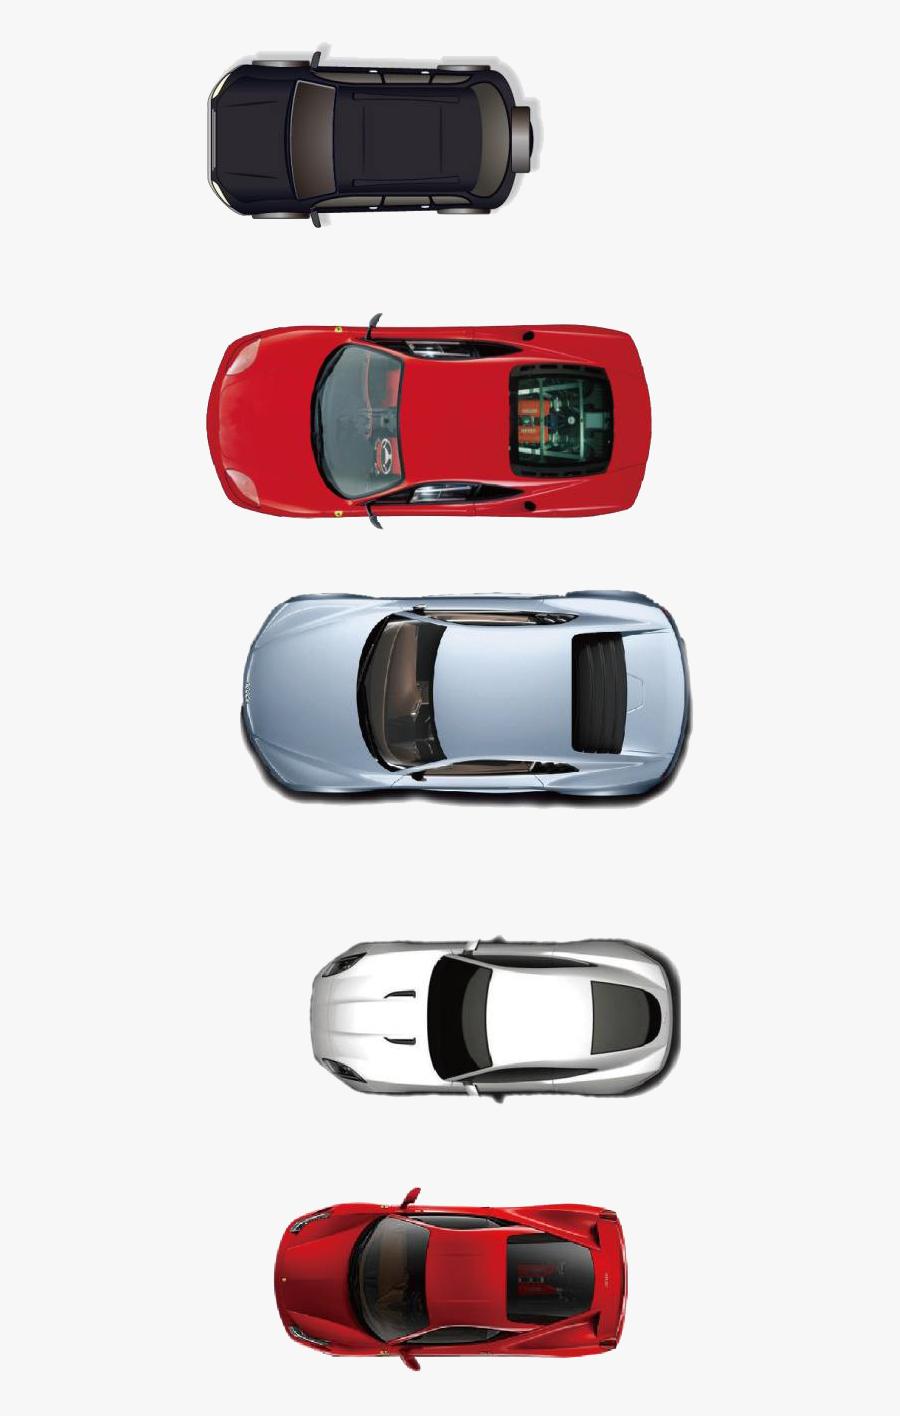 Car Top View Hd Image Free Png Clipart - 2d Top View Car, Transparent Clipart